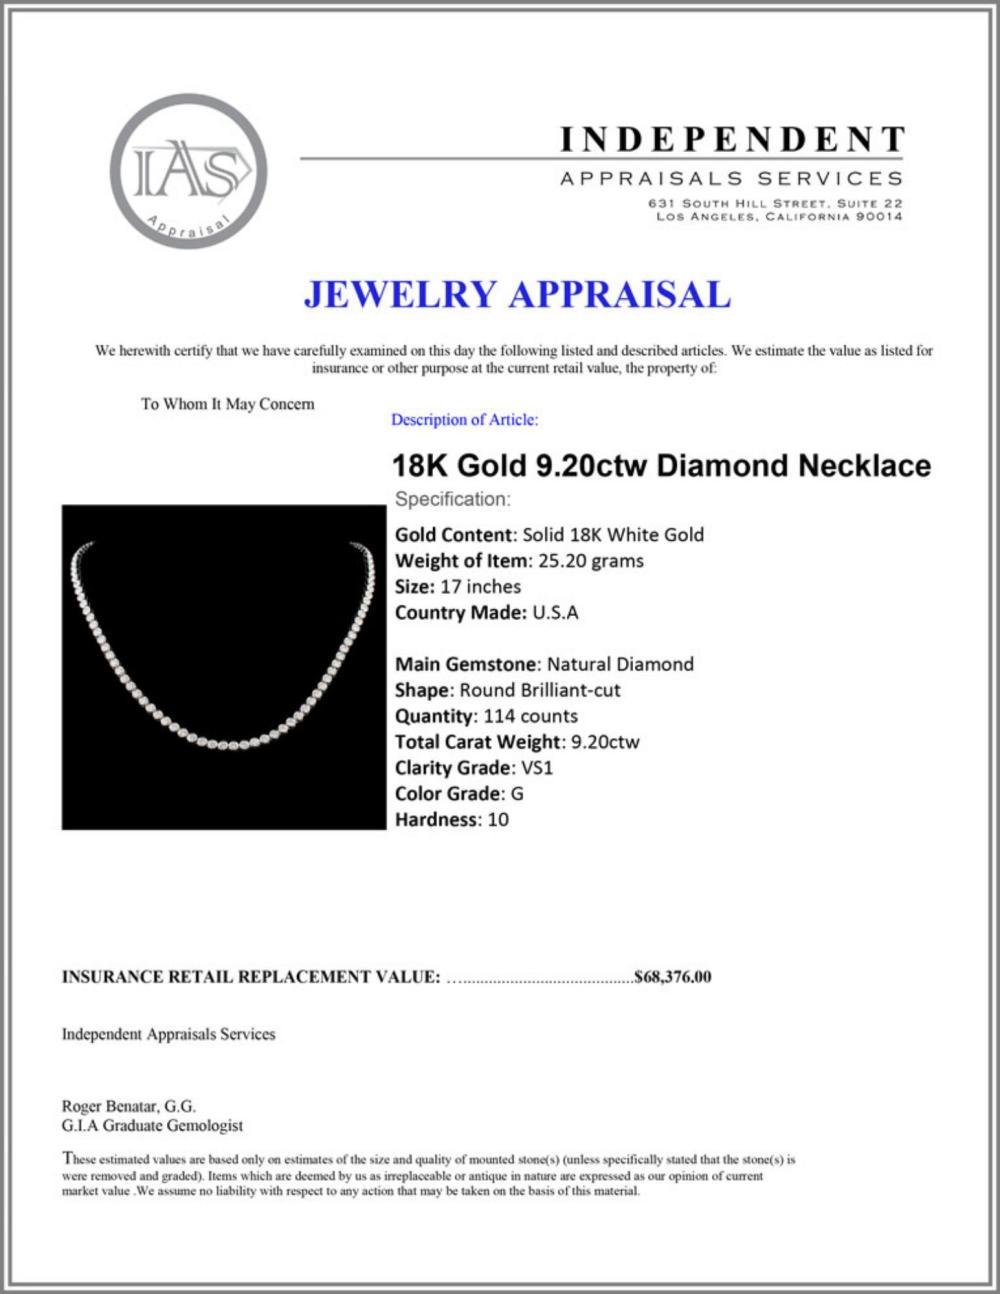 Lot 33: 18K Gold 9.20ctw Diamond Necklace